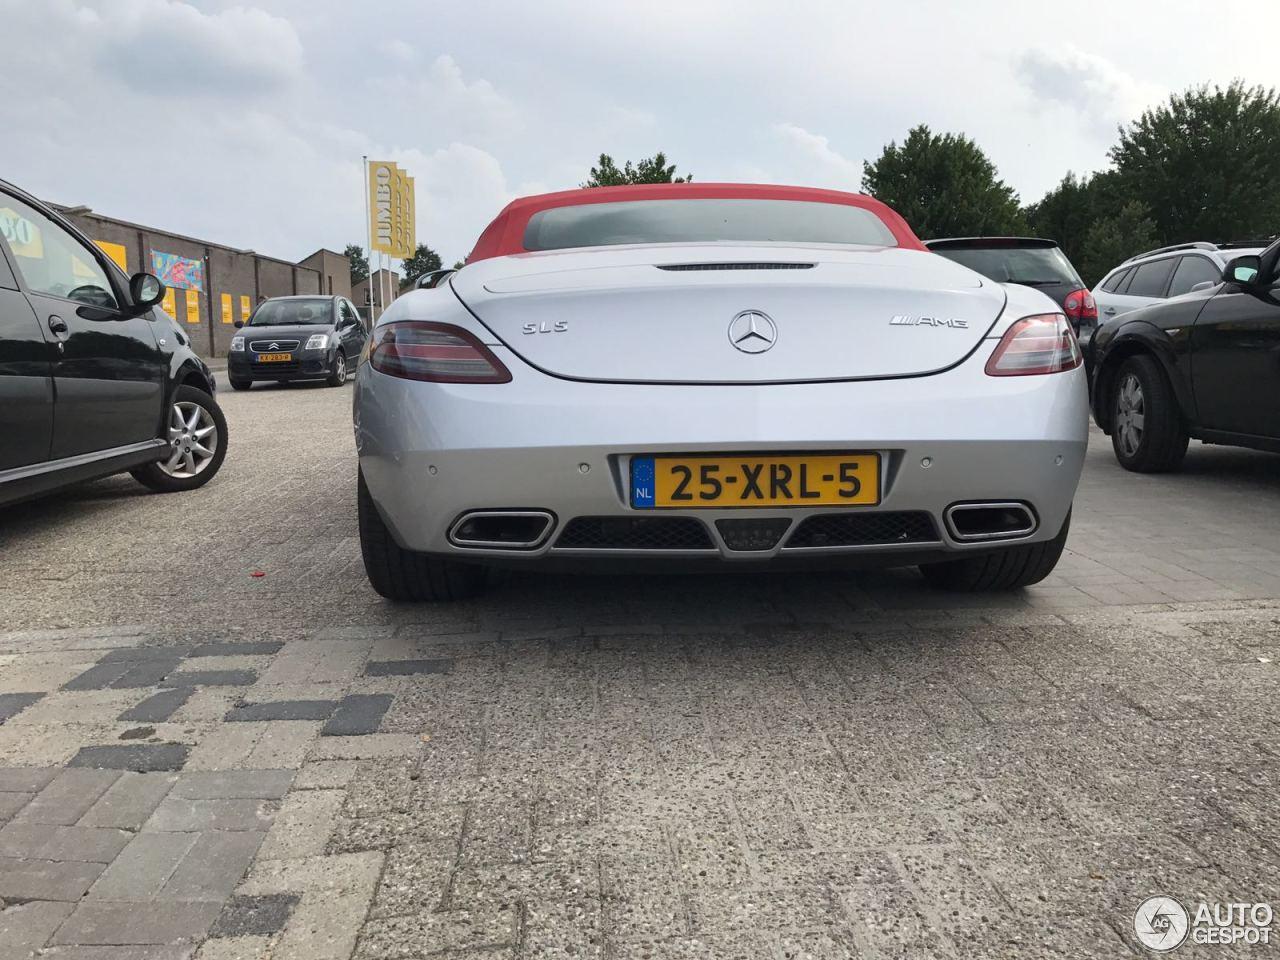 Mercedes Benz Sls Amg Roadster 18 January 2018 Autogespot